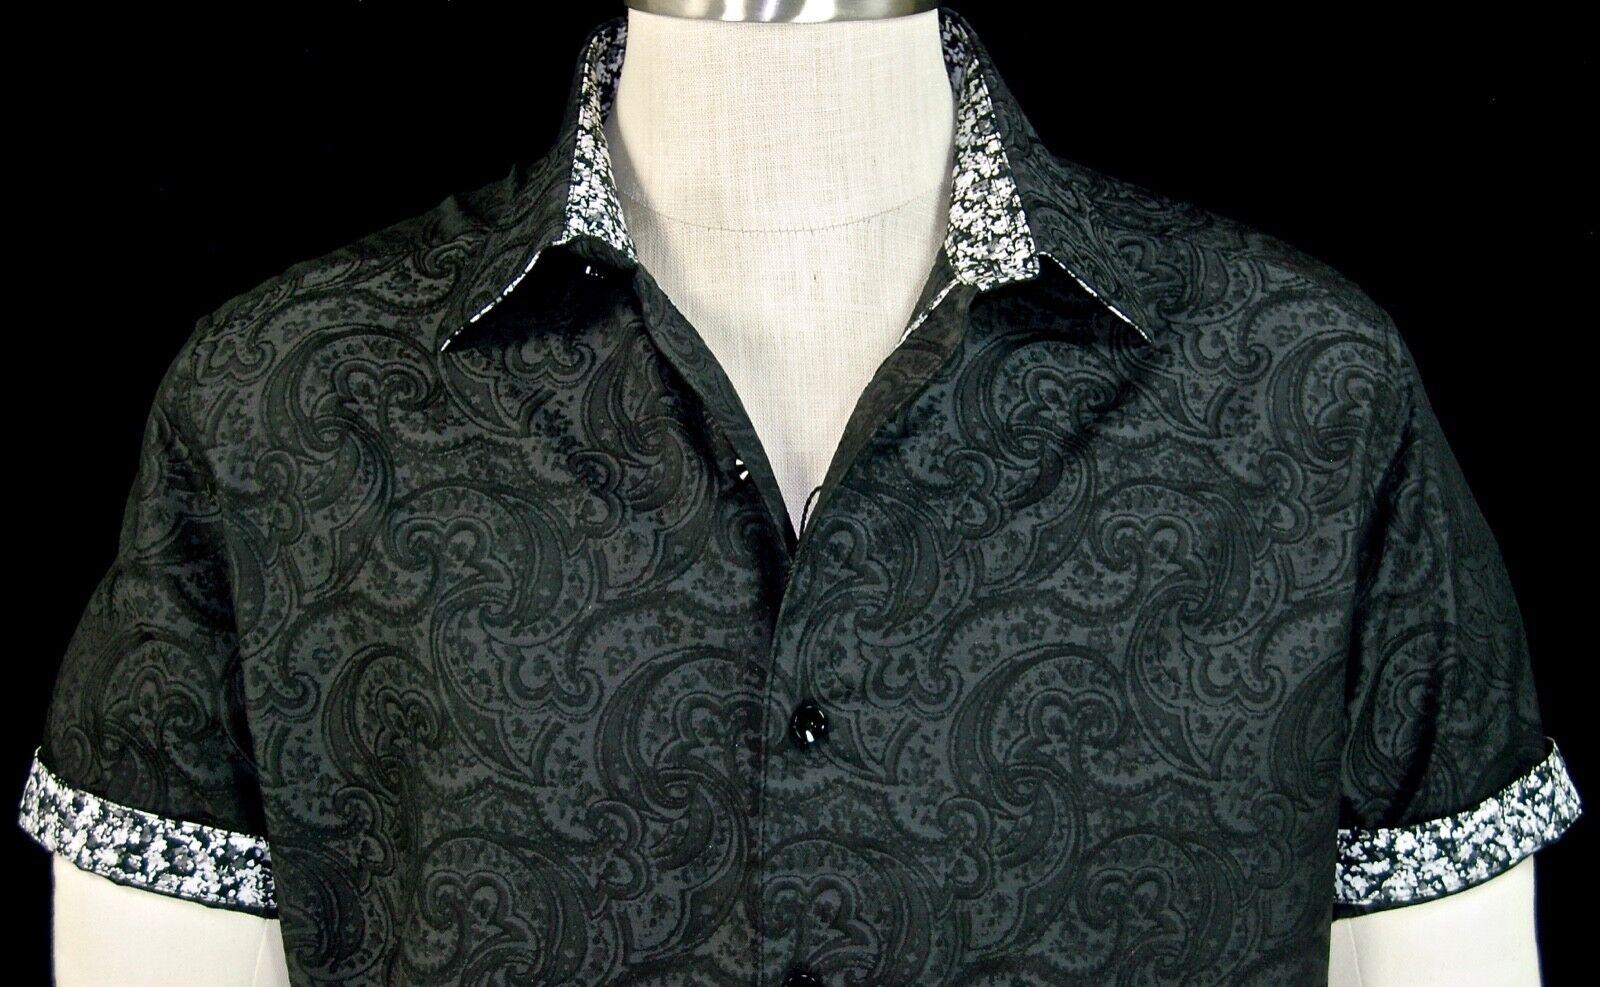 Robert Graham Black NWT Paisley Jacquard Short Sleeve Floral Cuffs XL